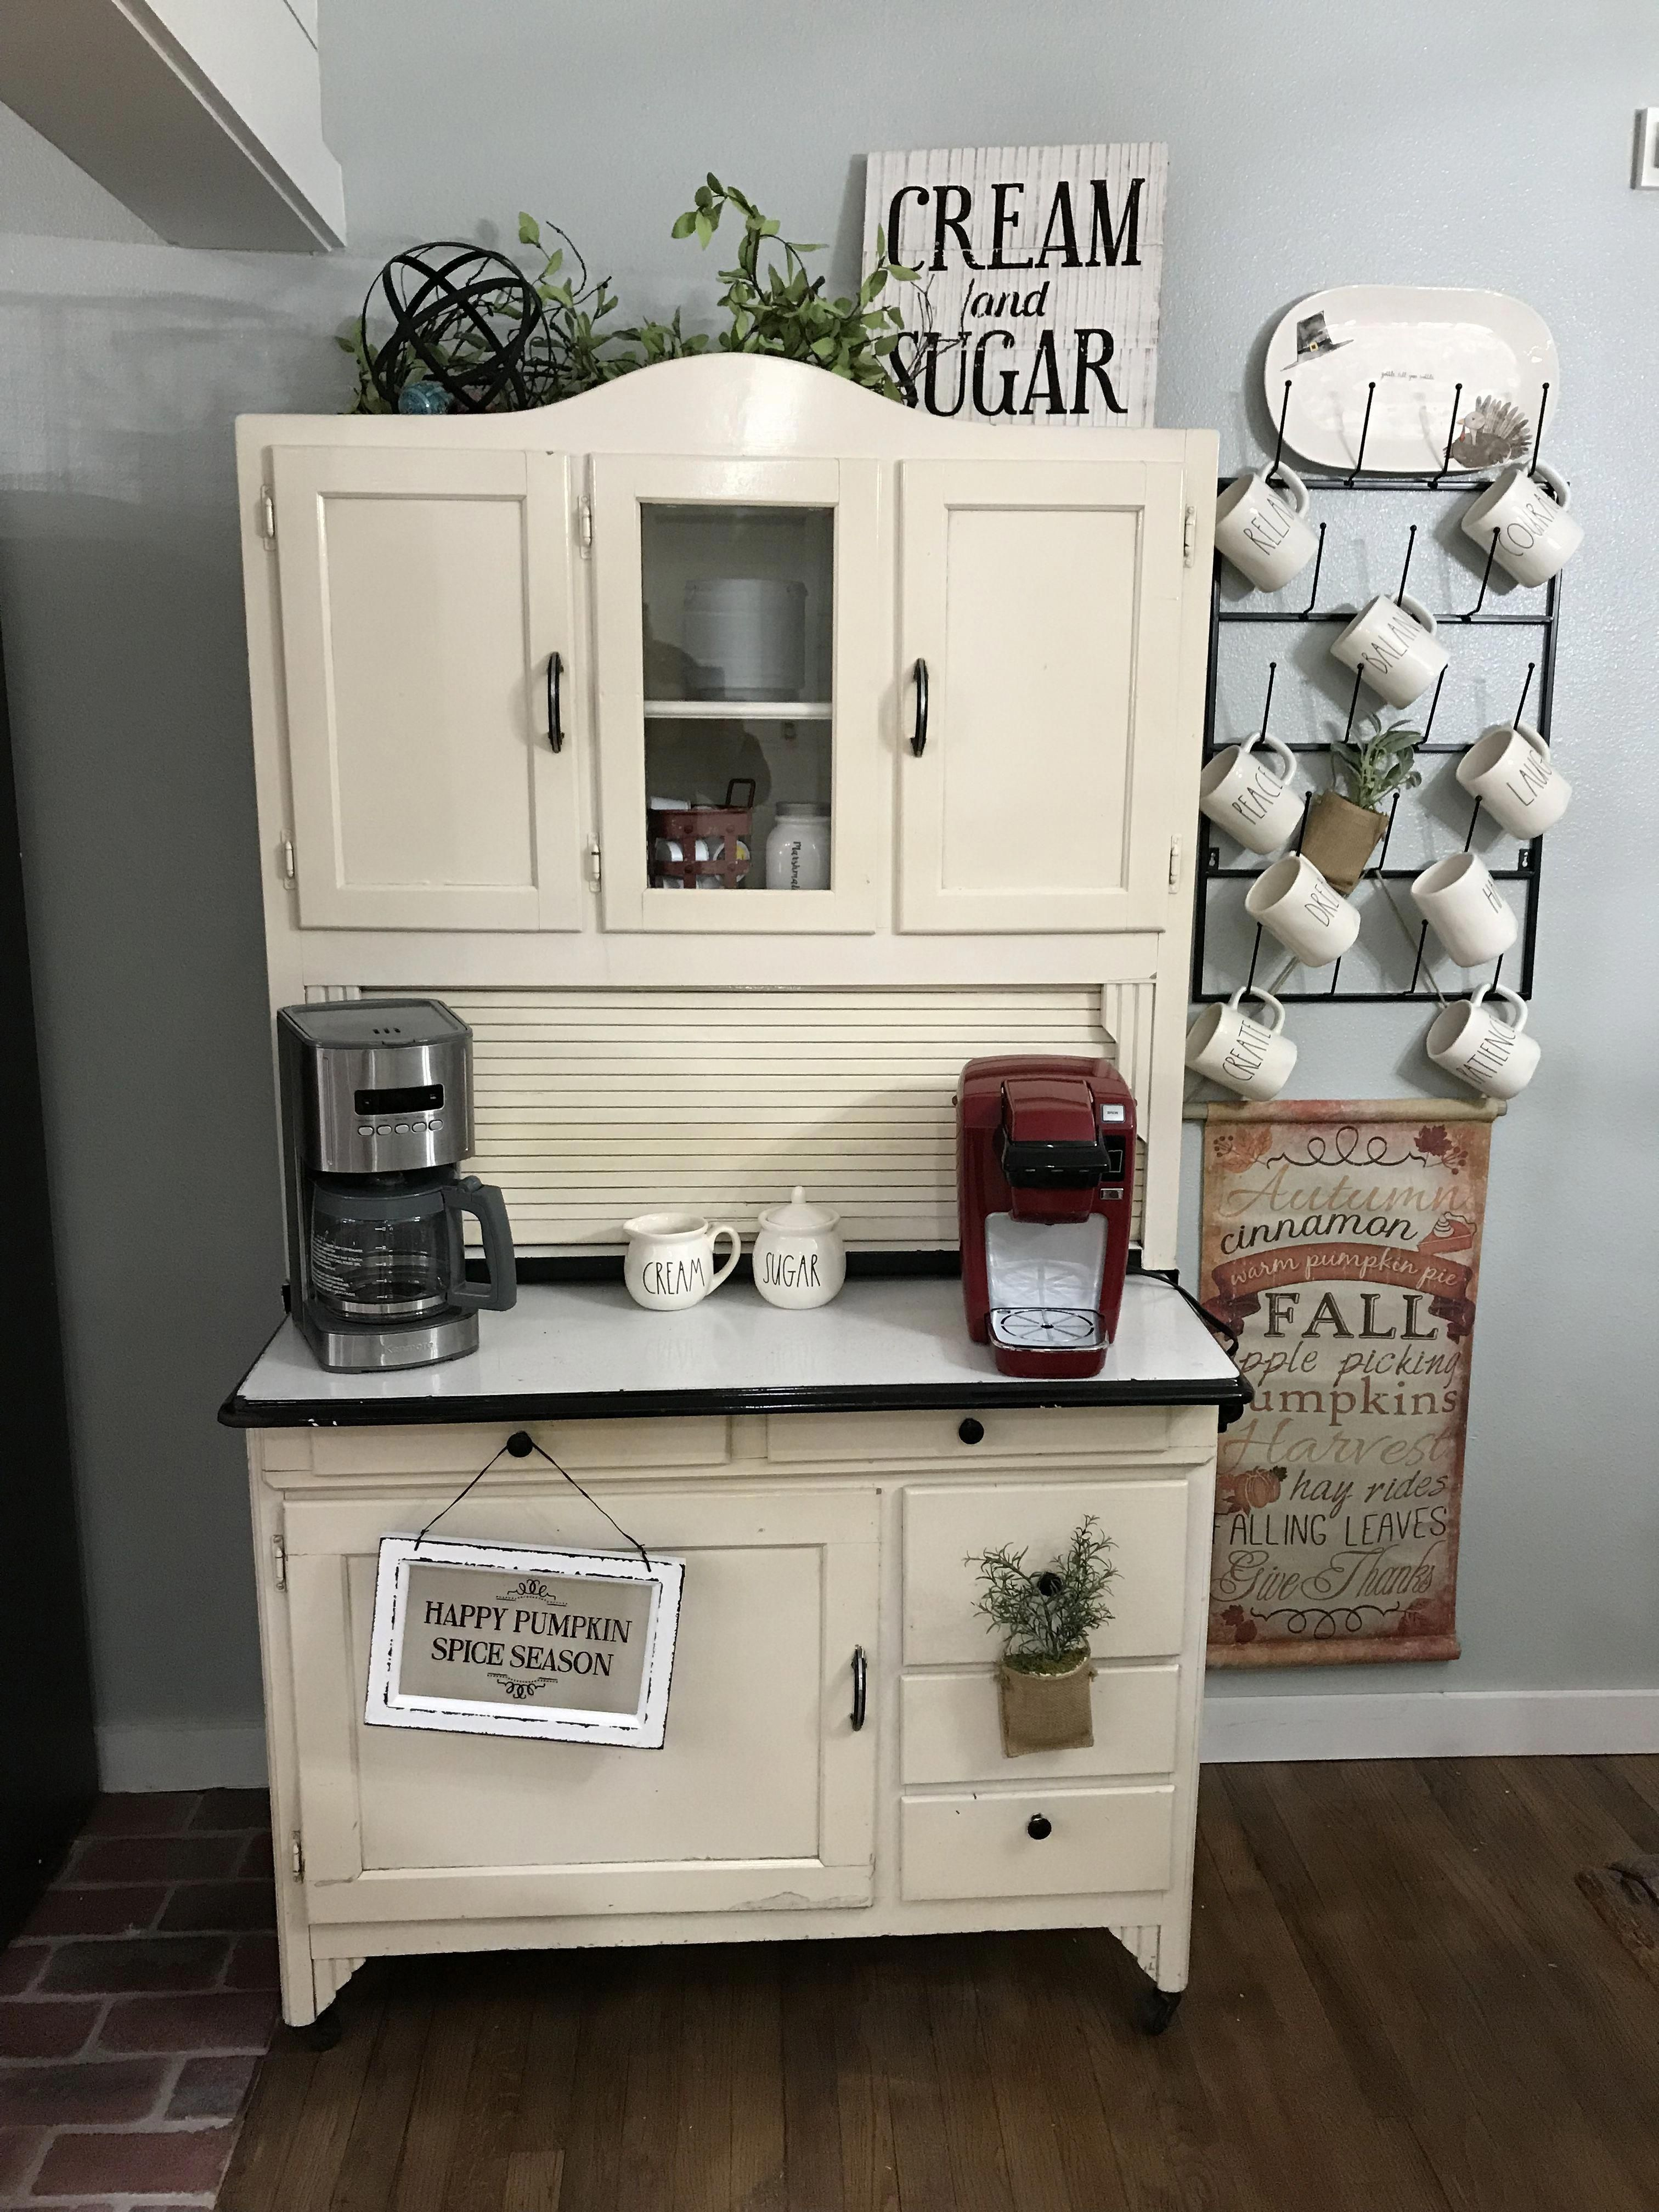 DIY Coffee Cup Rack Autumn + Ash